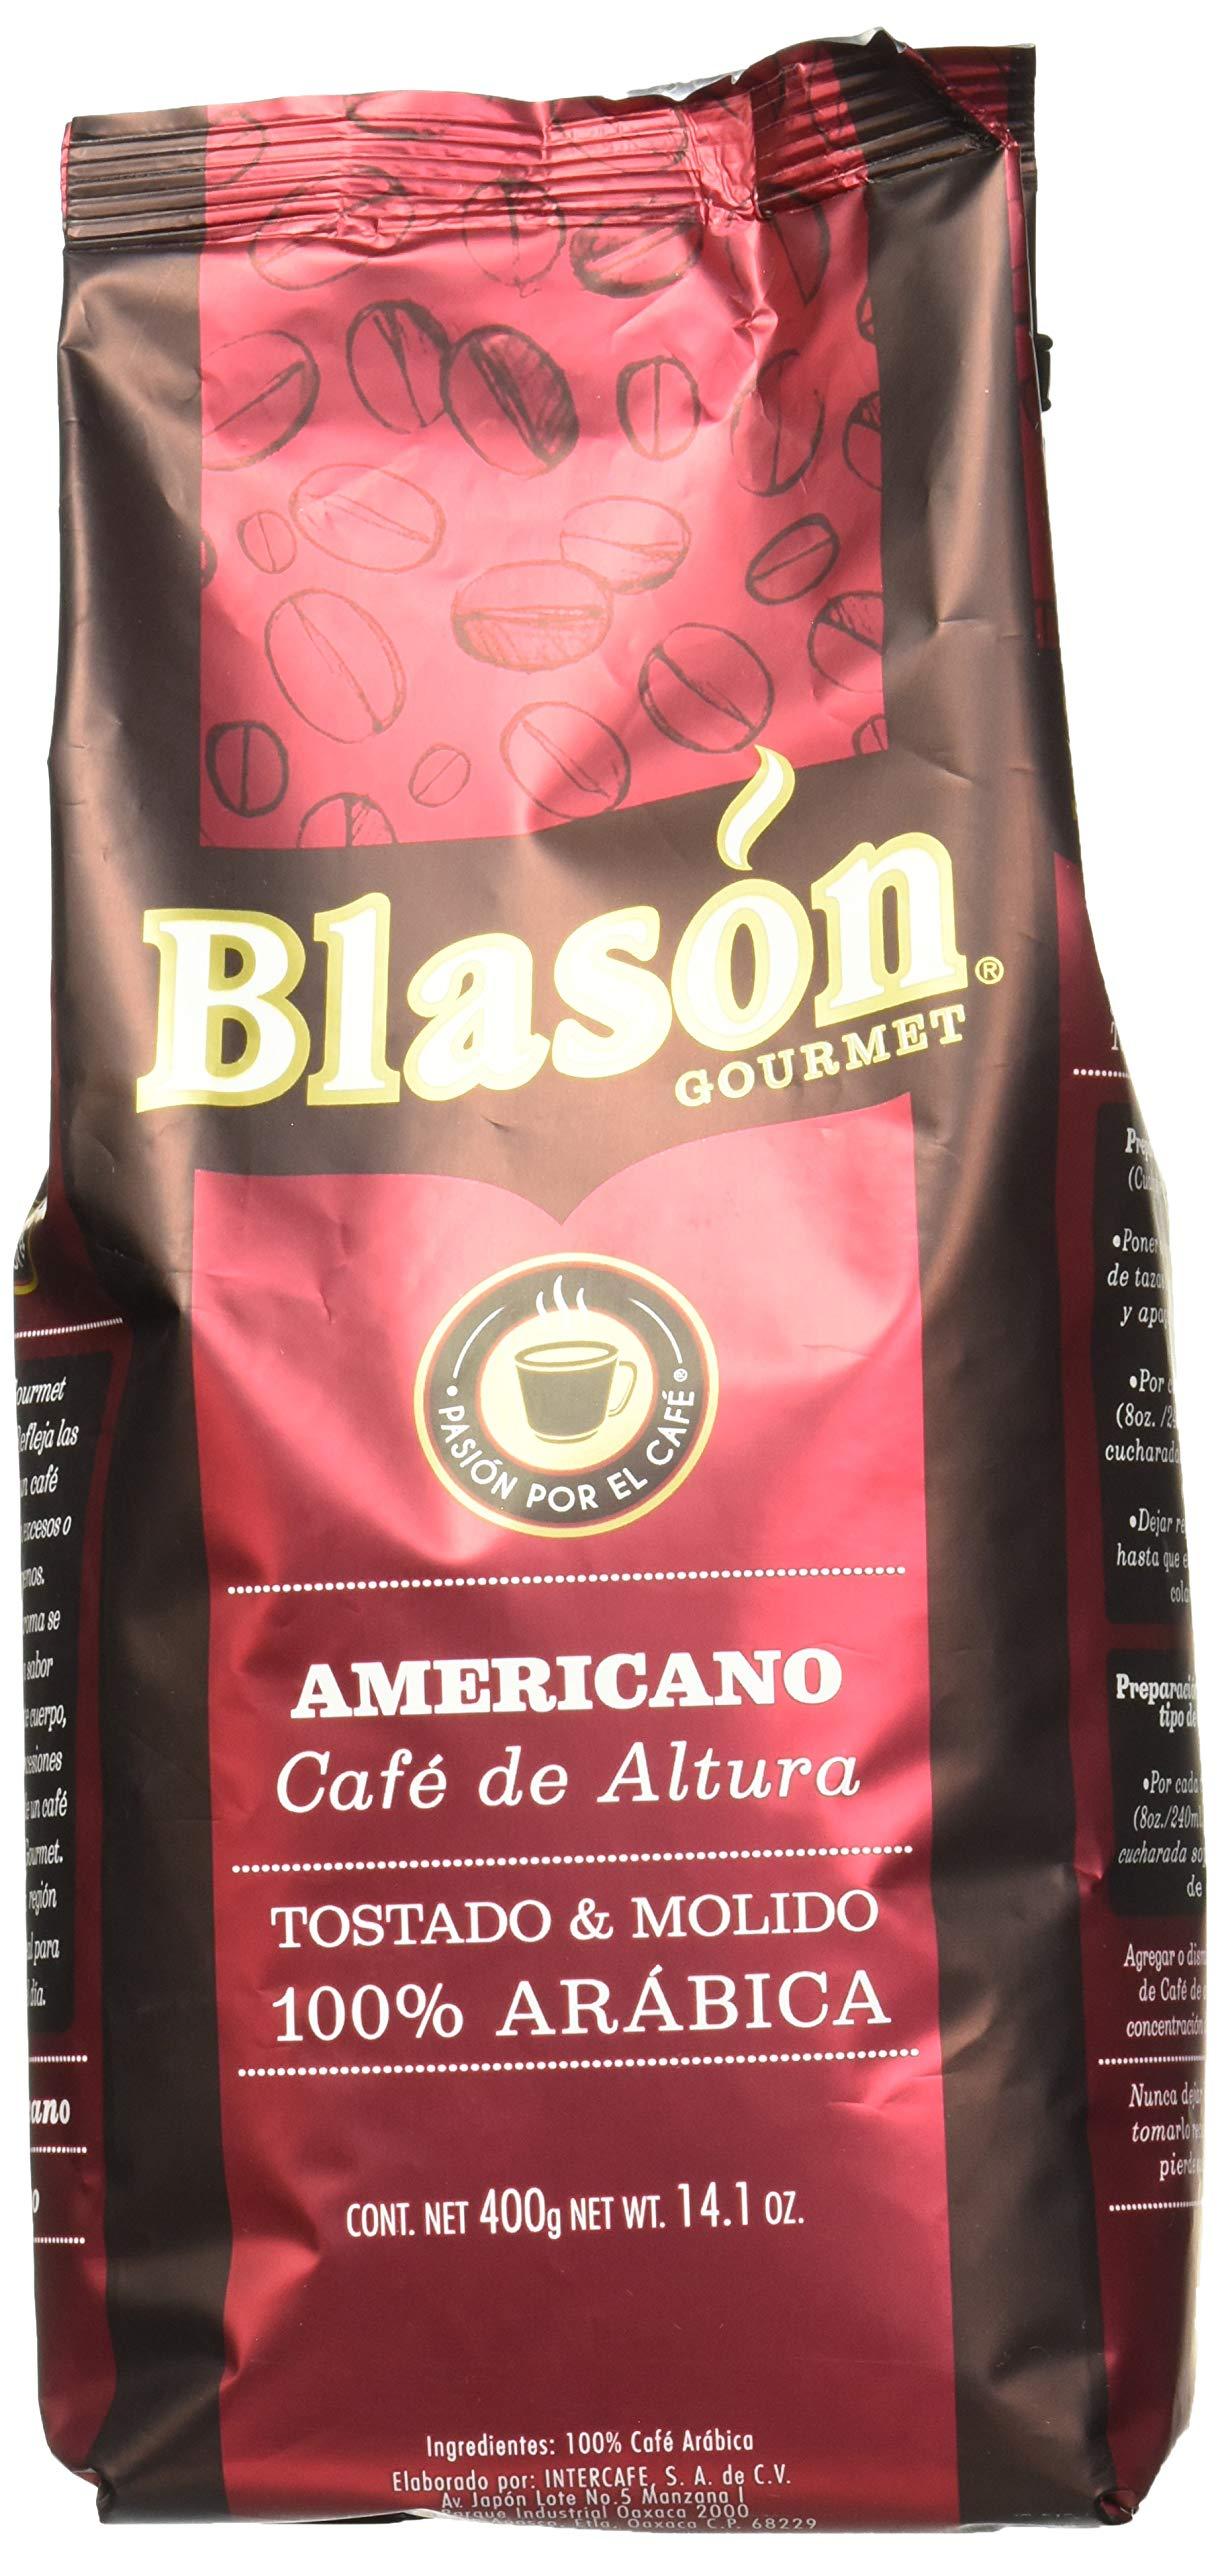 Mexican Blason Americano Ground Coffee, 14.1 Ounces